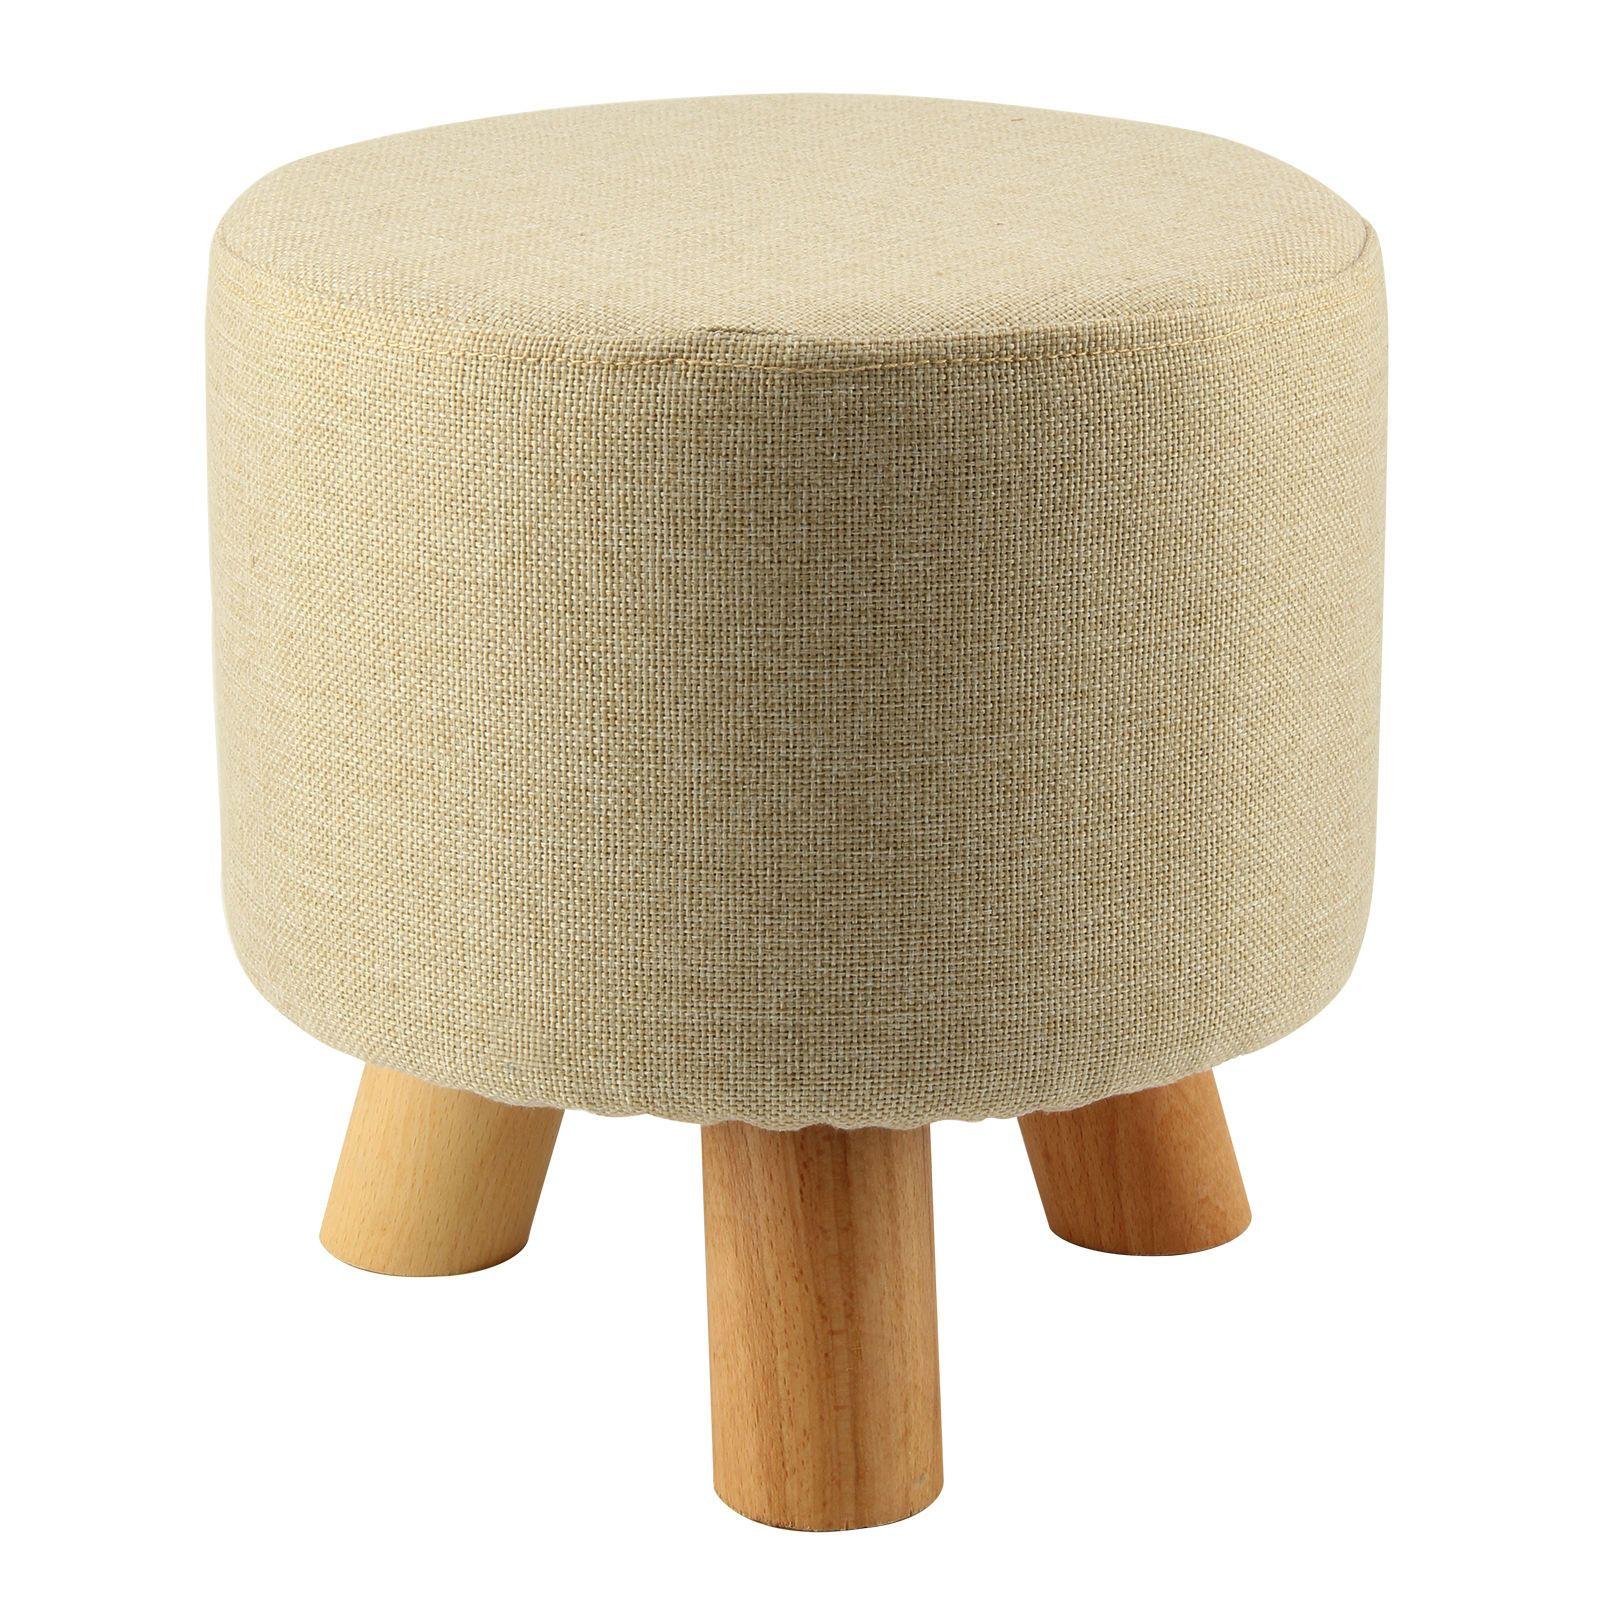 Modern Luxury Upholstered Footstool Round Pouffe Stool + Wooden Leg Pattern:Round Fabric:Grey(3 Legs)